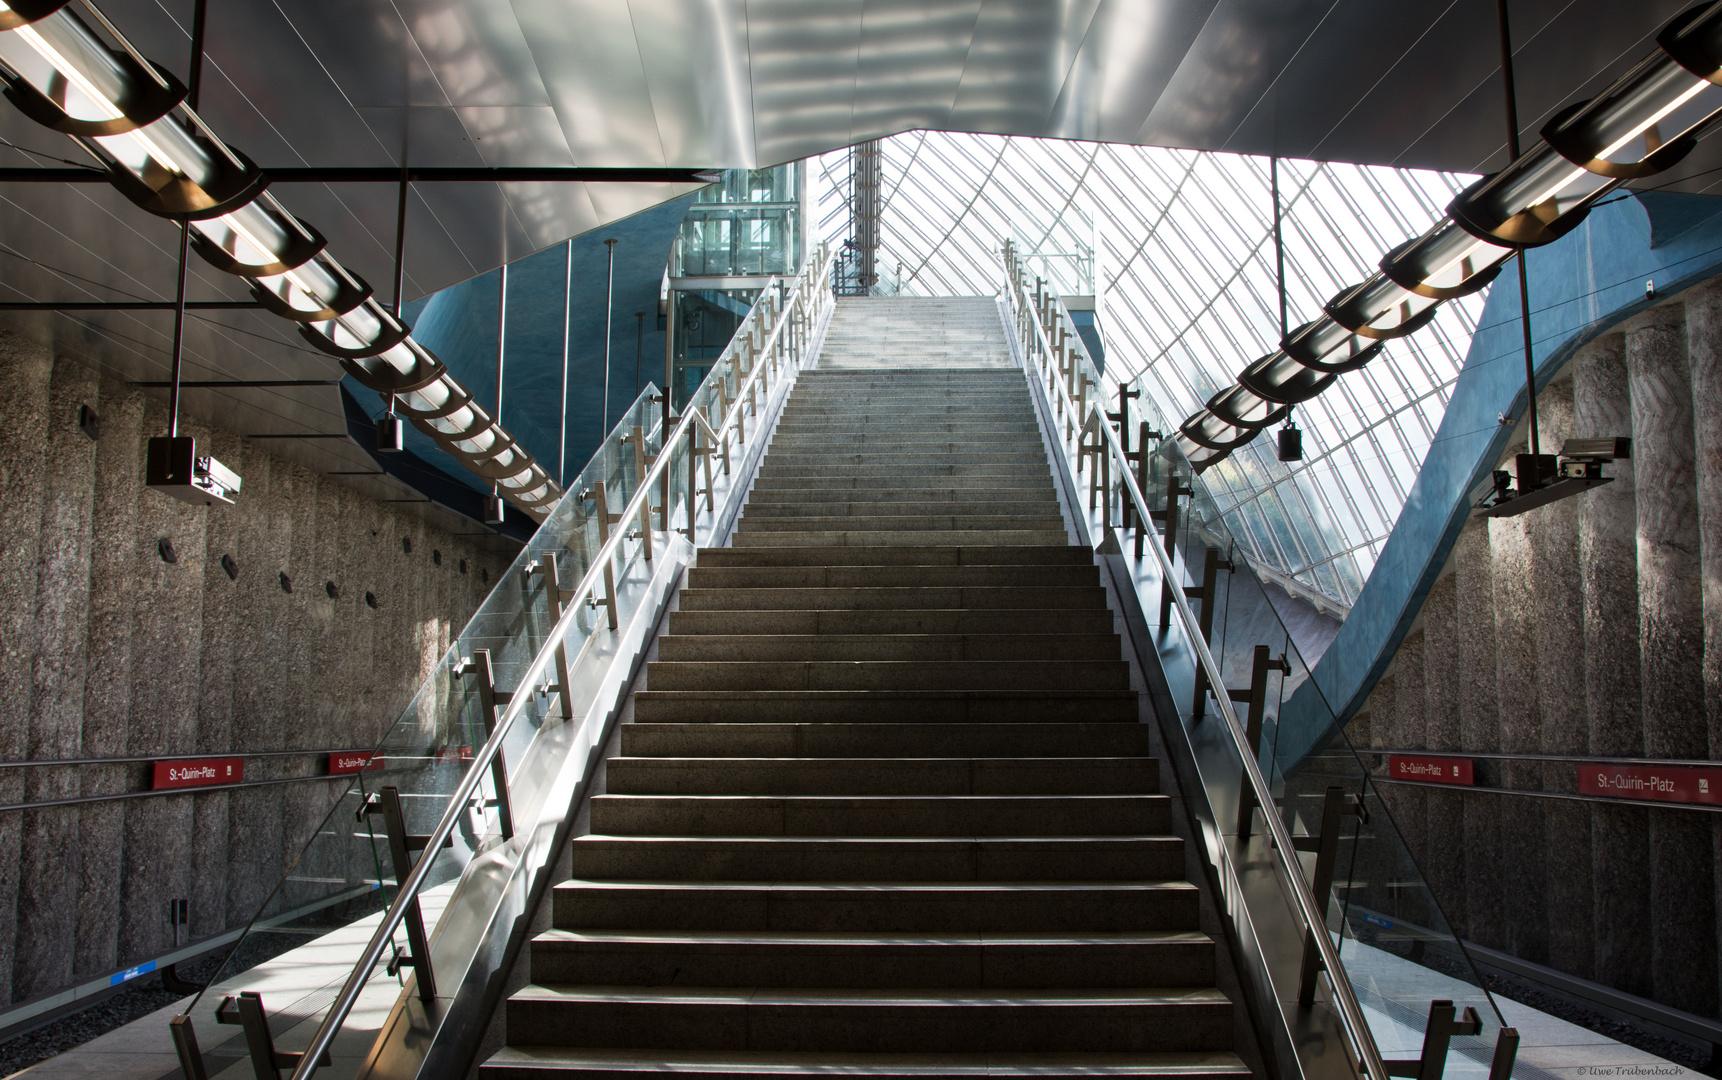 U-Bahnhof St.-Quirin-Platz (3)